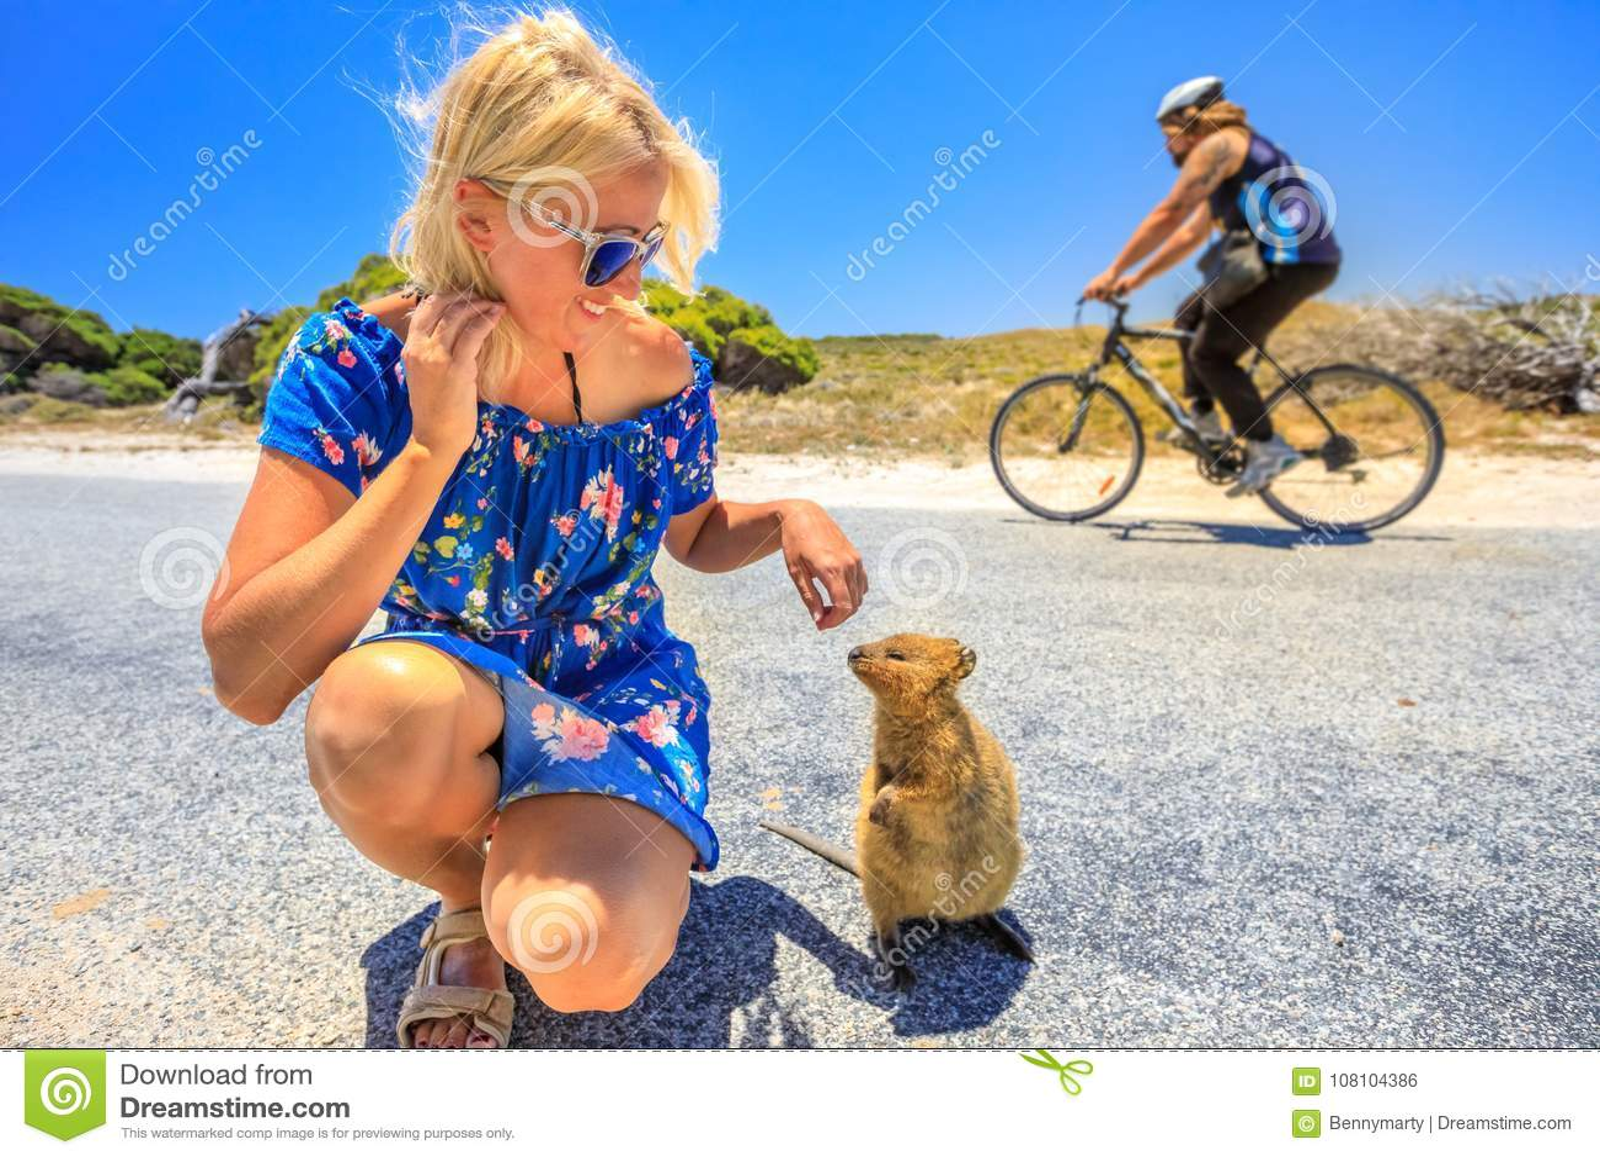 Tourist woman with Quokka